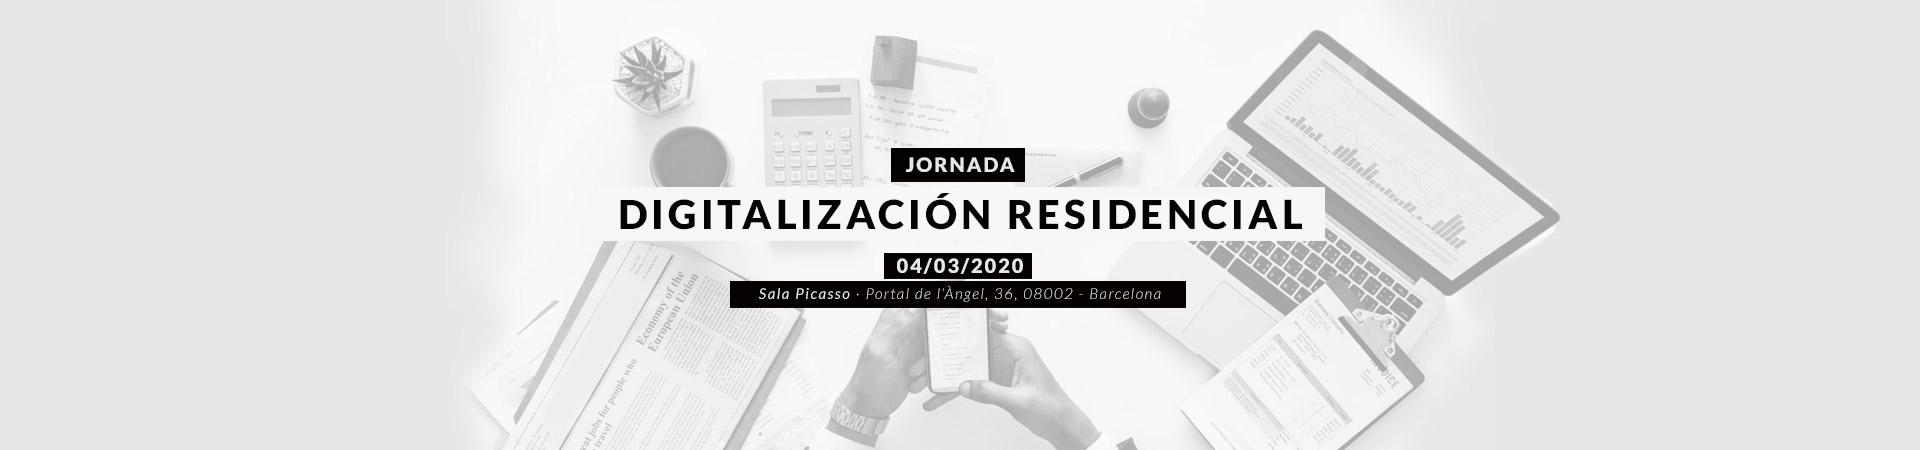 Slide-JornadaDigitalizacionResidencial-202003